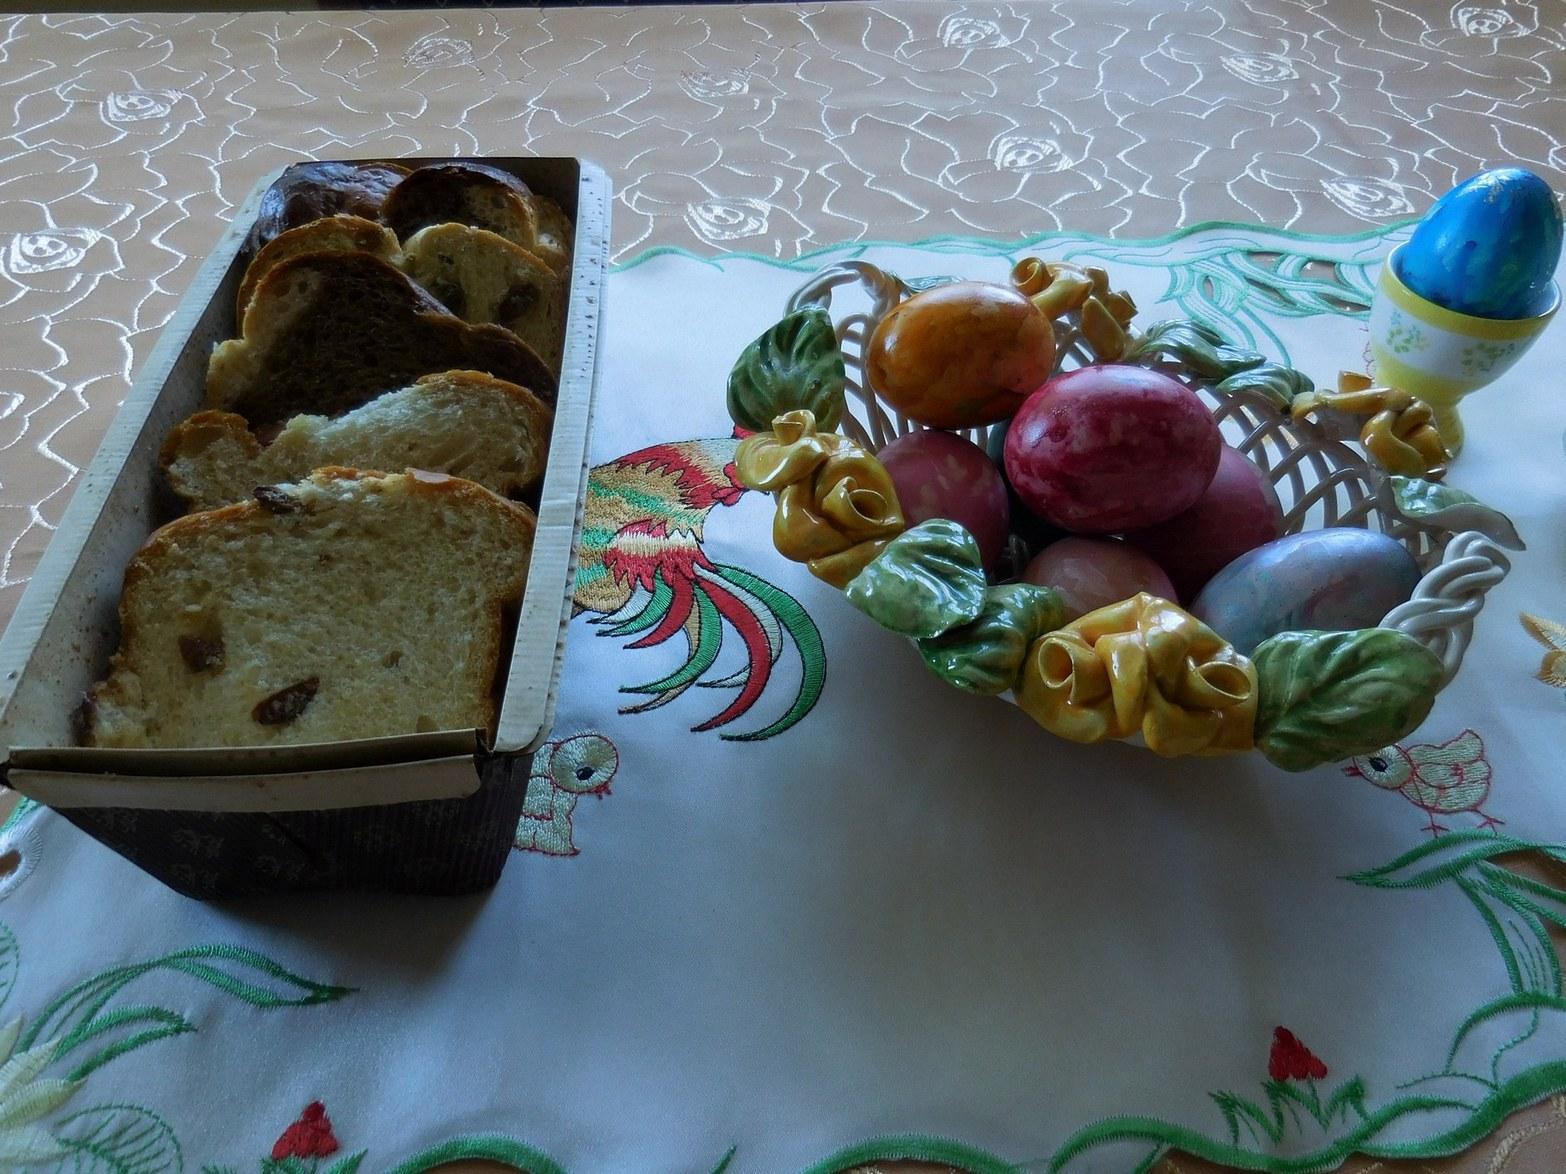 Easter, Colourful Eggs, Bulgaria, Orthodox, Featured Image, Table